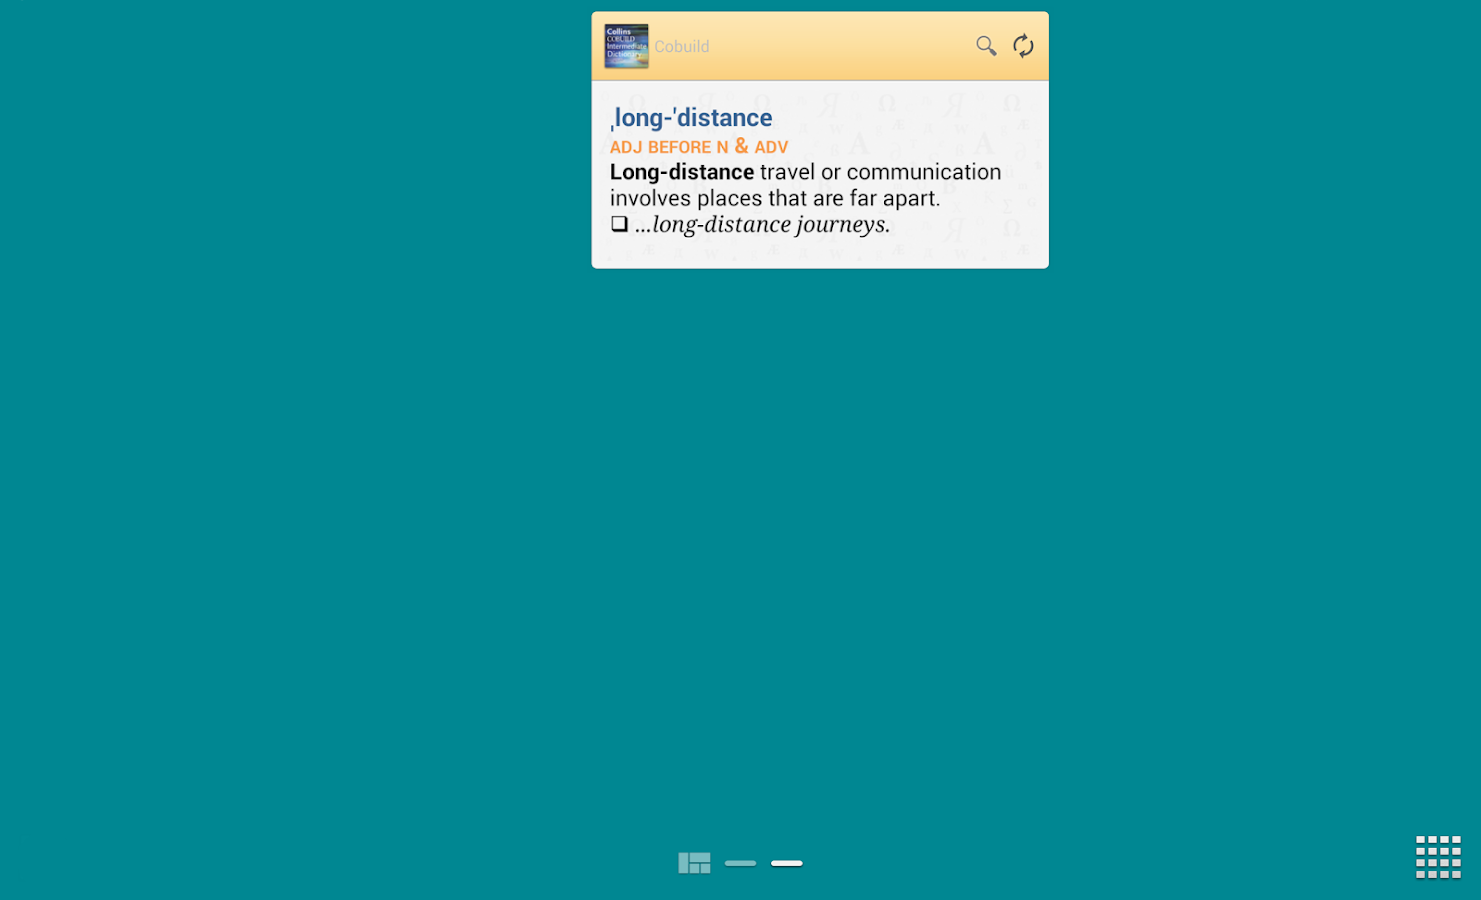 Collins Cobuild IntermediateTR - screenshot